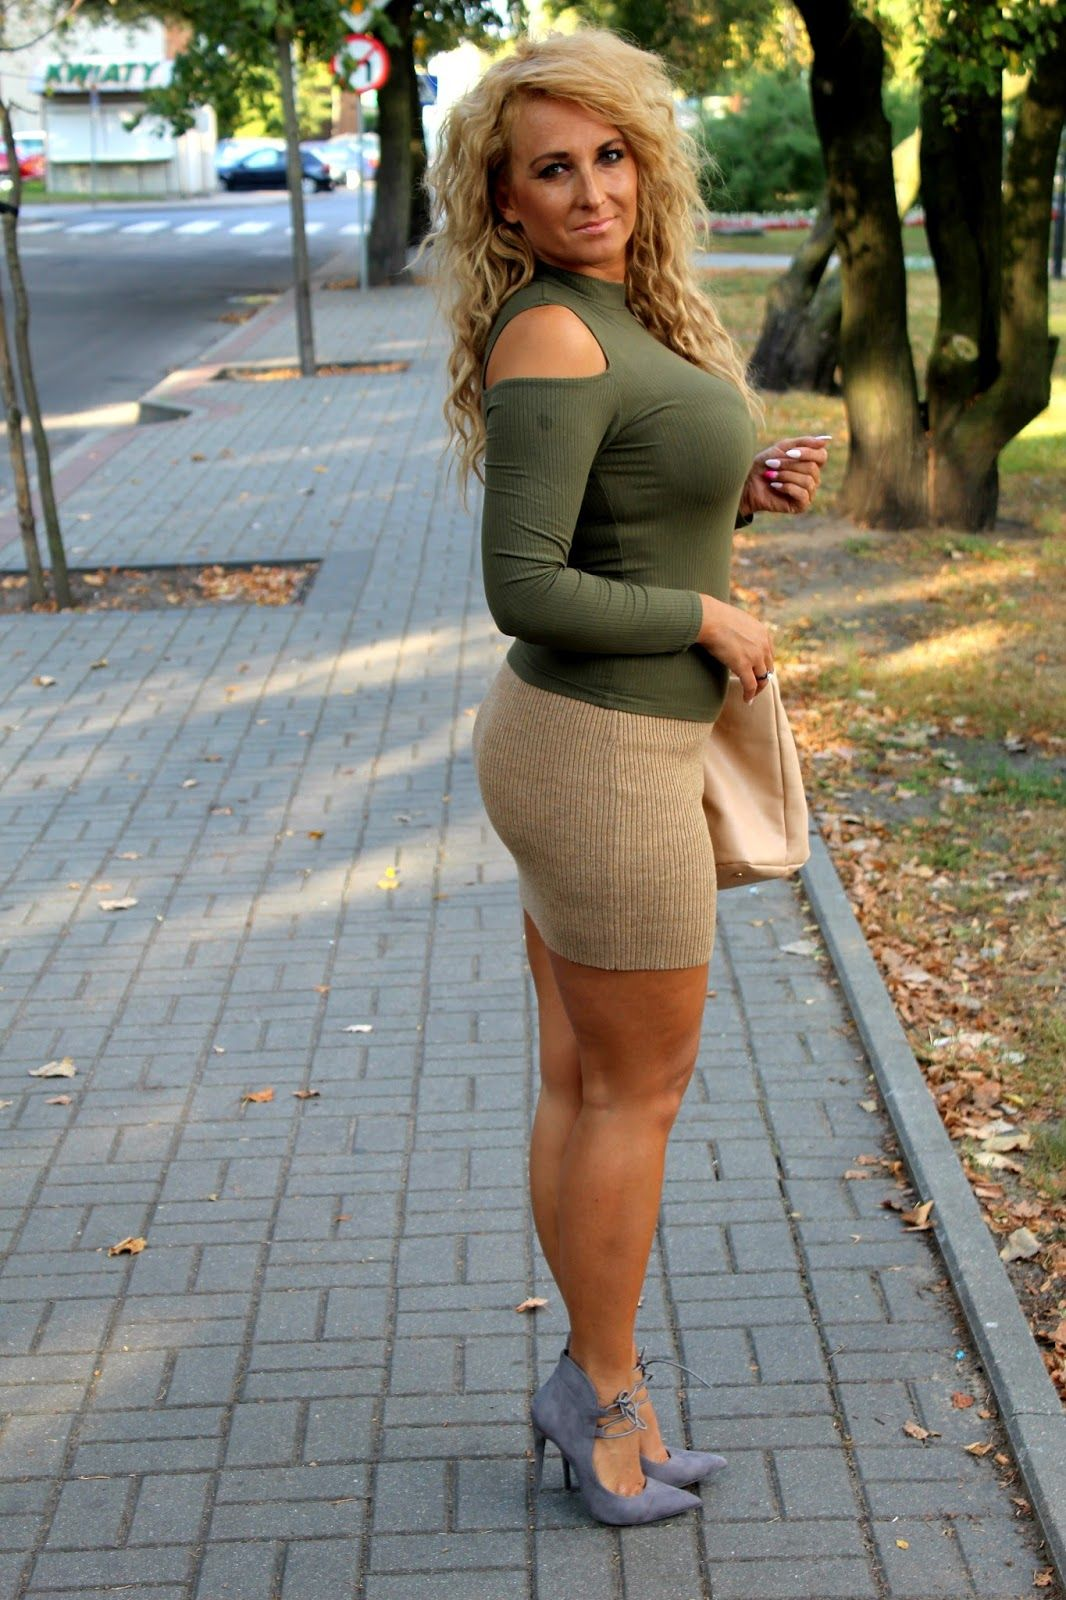 cfe723f957 Like my skirt? | Hot | Sexy older women, Sexy, Older women